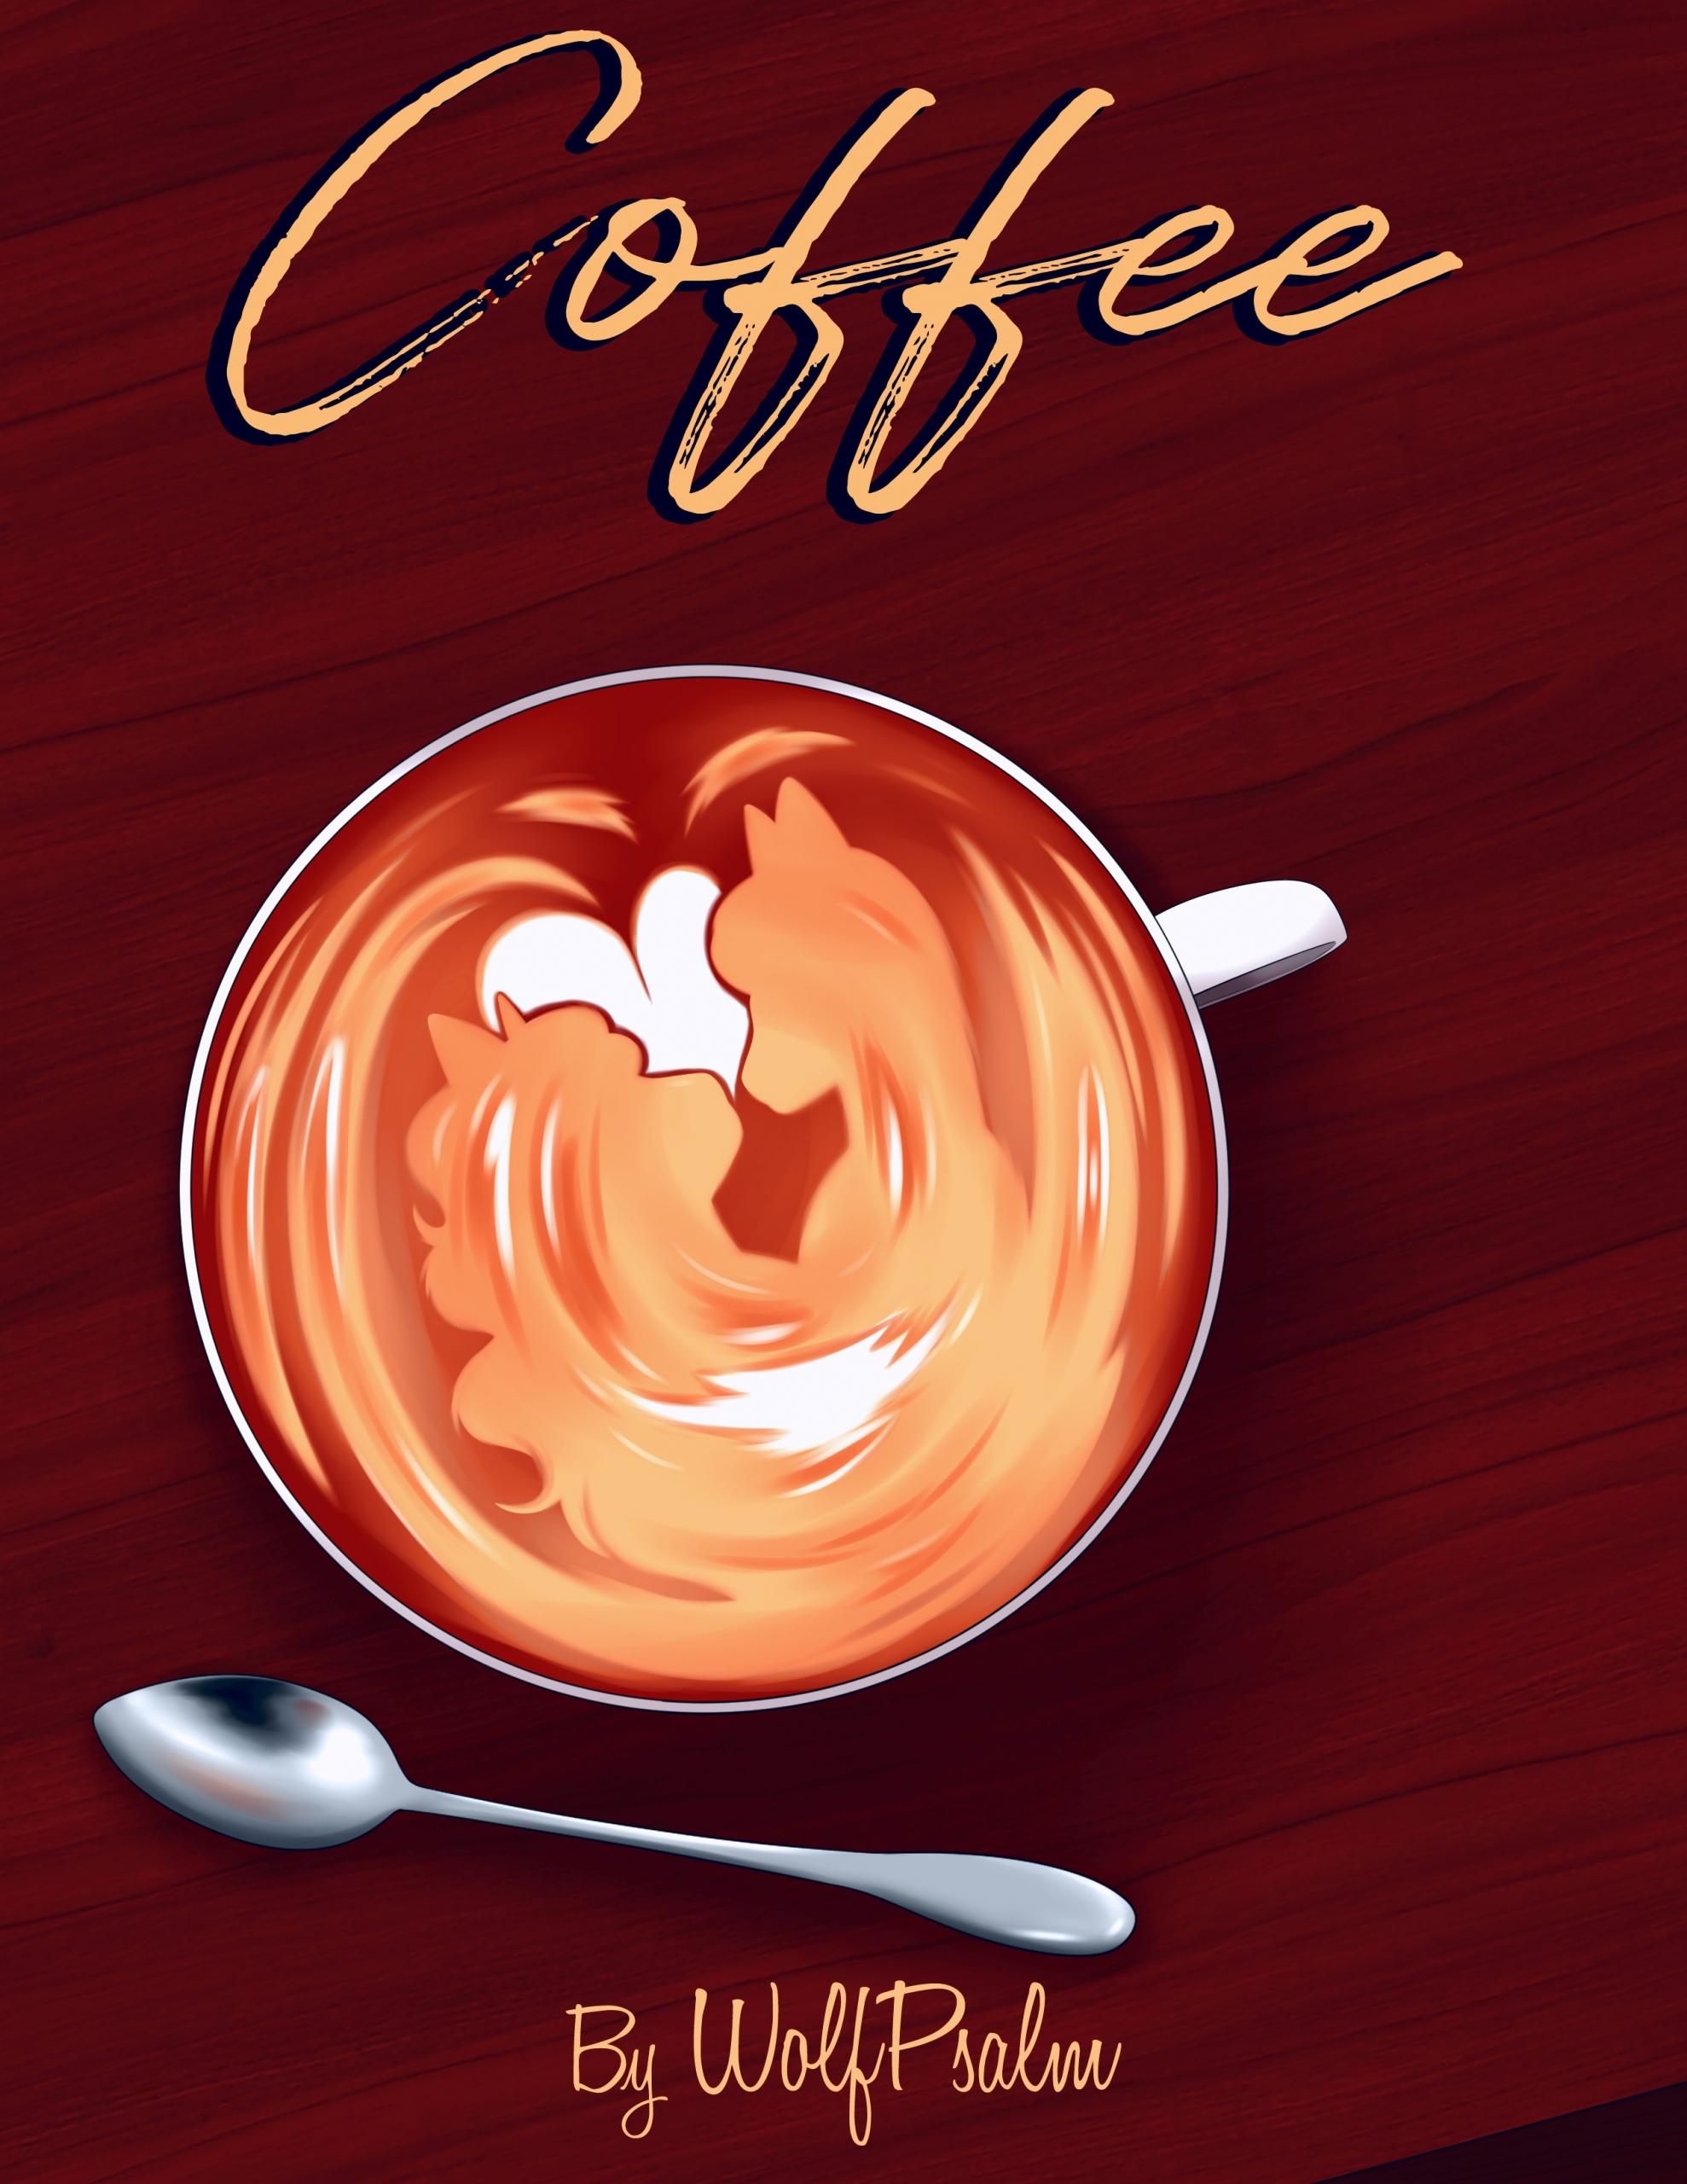 Coffee furry porn comic page 001